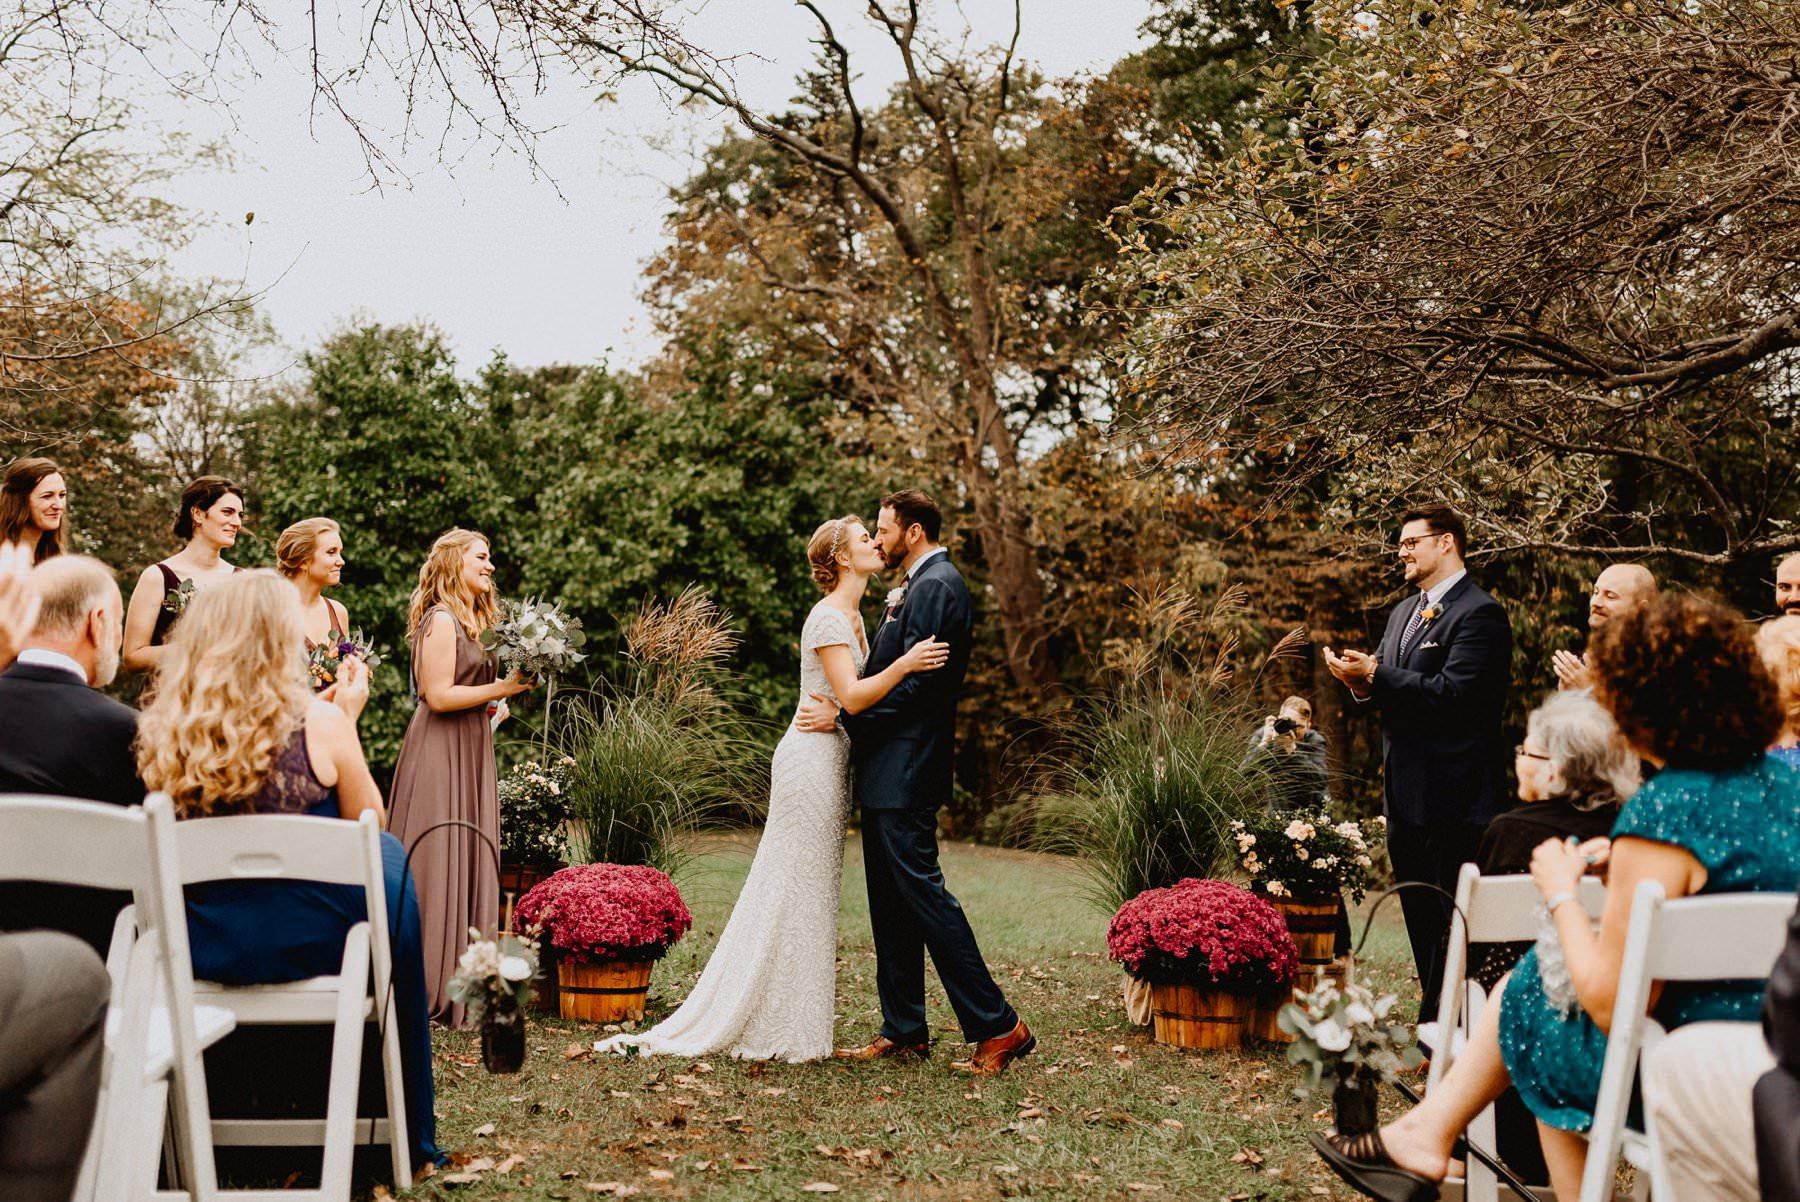 John_James_Audubon_Center_wedding-53.jpg